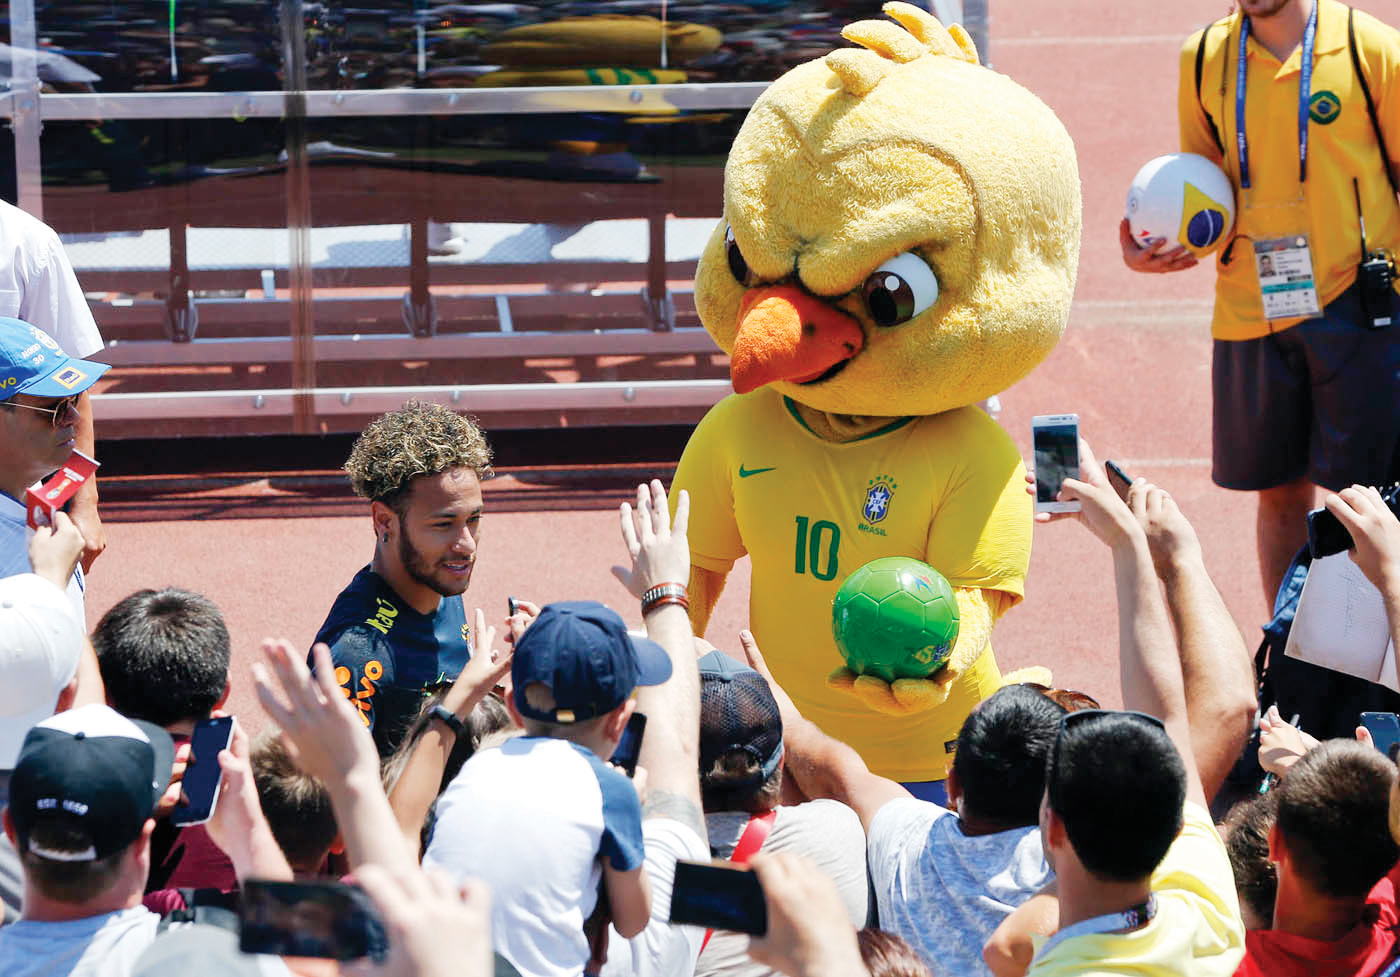 Un canario furioso, popular mascota de Brasil en el Mundial